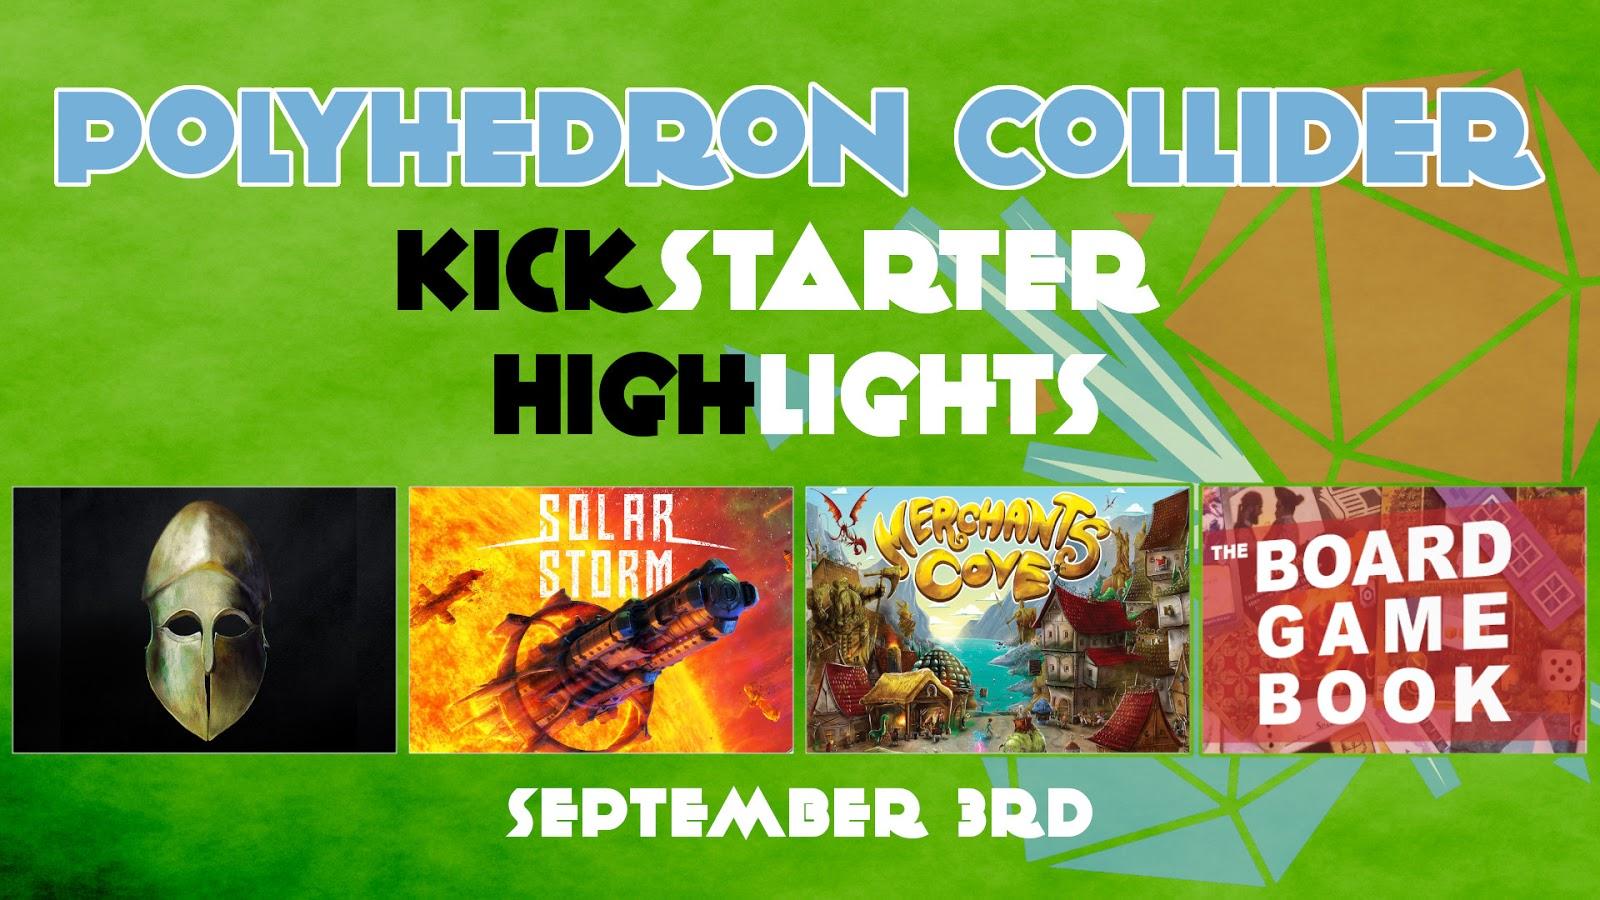 Kickstarter Highlights - Board Game Book, Merchants Cove, Successors, Solar Storm